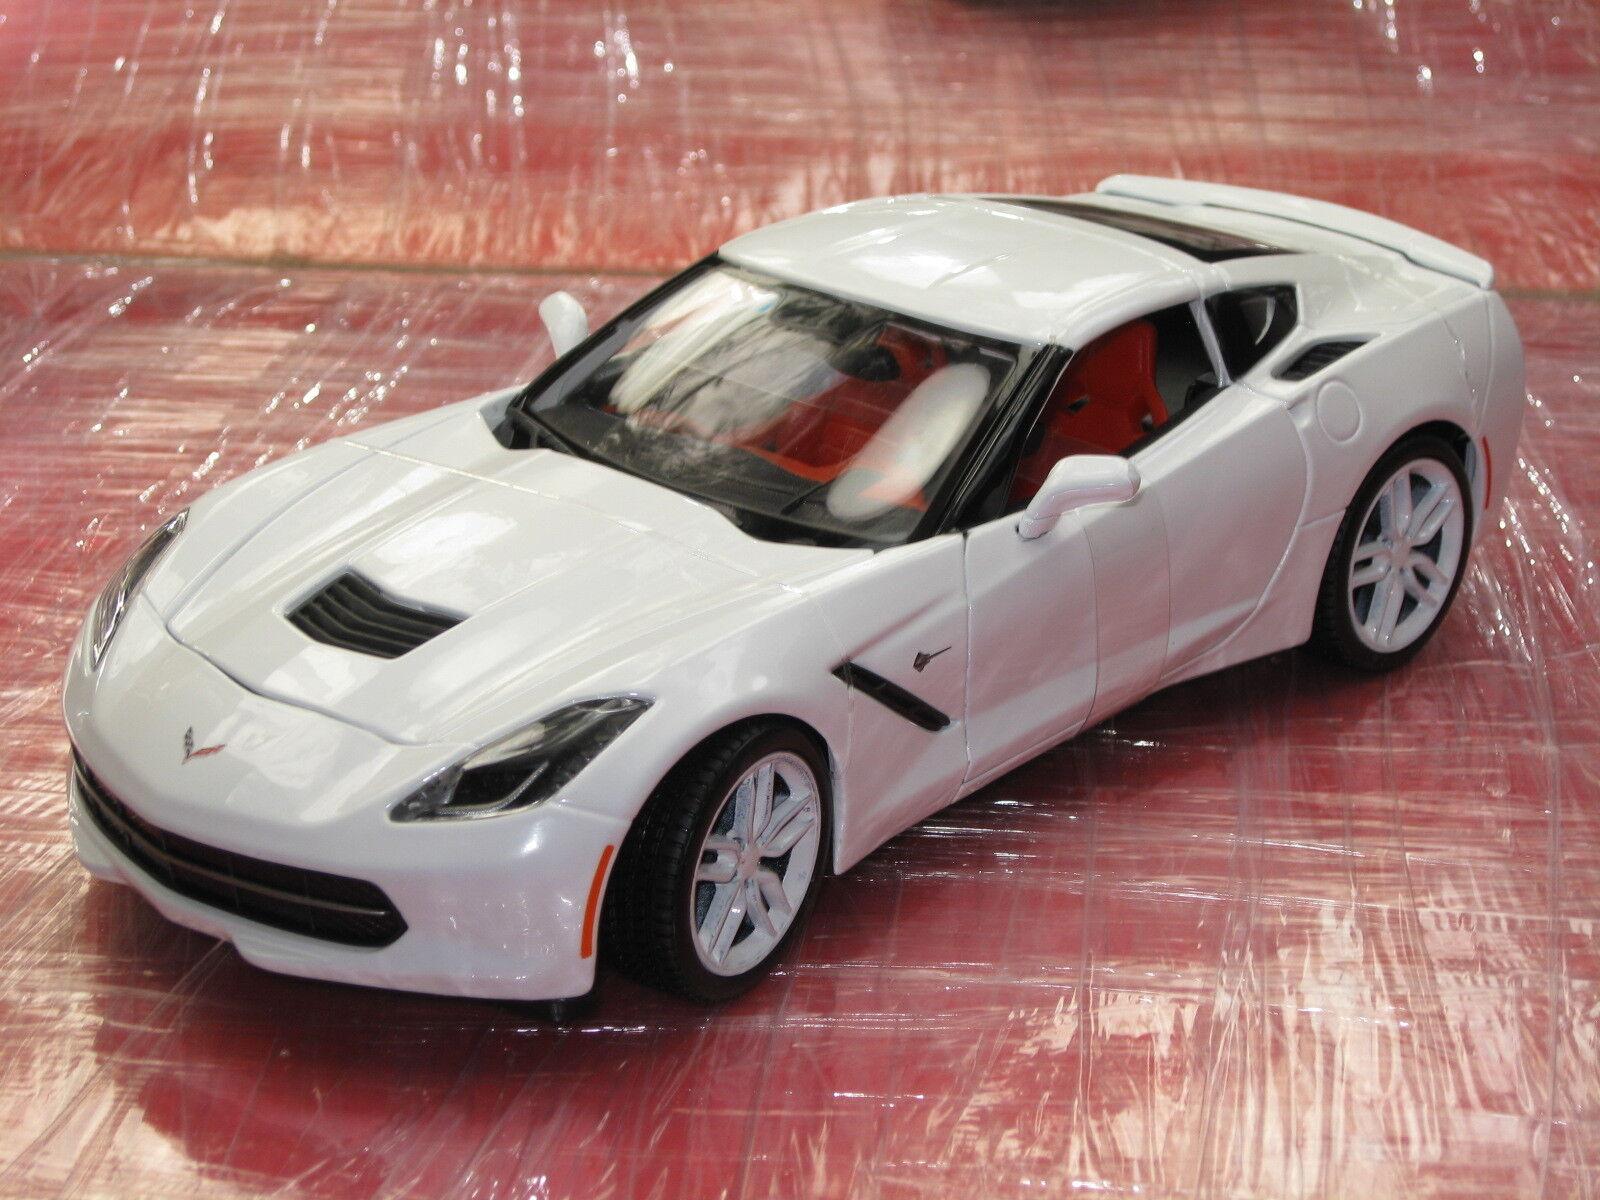 venta al por mayor barato 2014 Corvette Stingris Z51 blancoo Ártico Nuevo En Caja       bajo precio